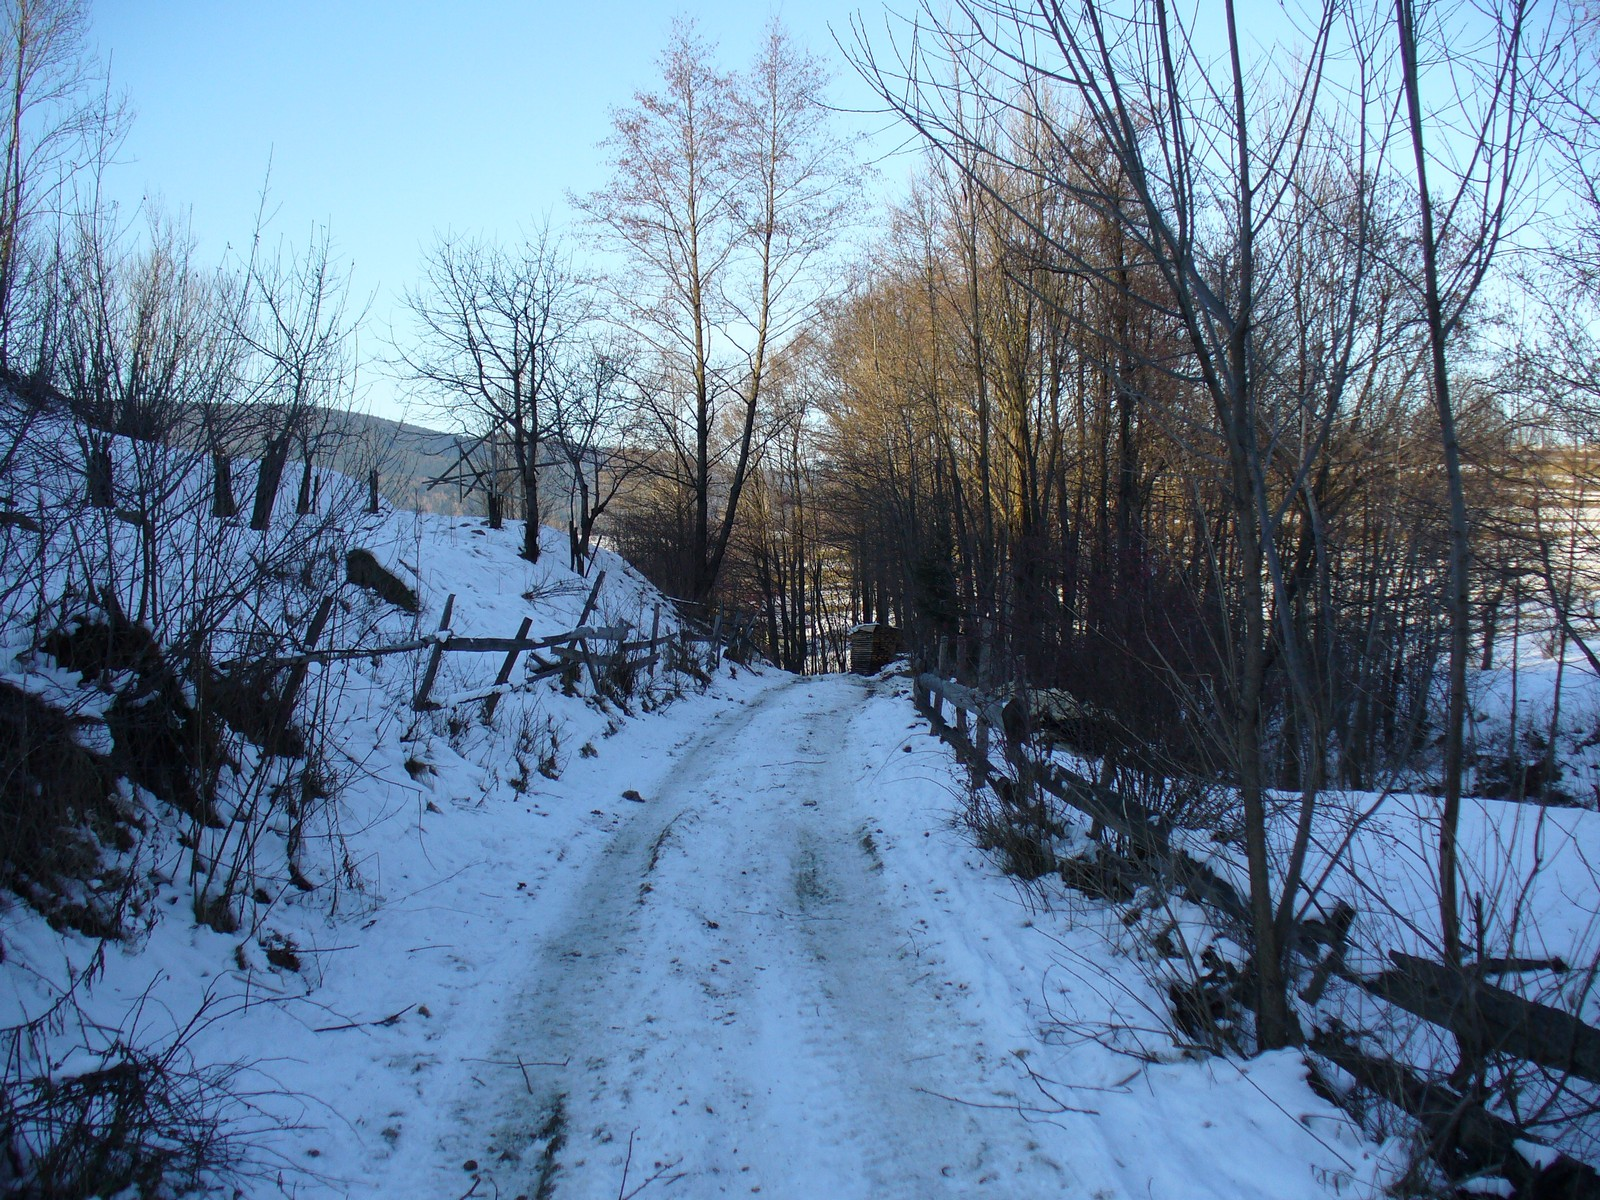 Polna droga zimą